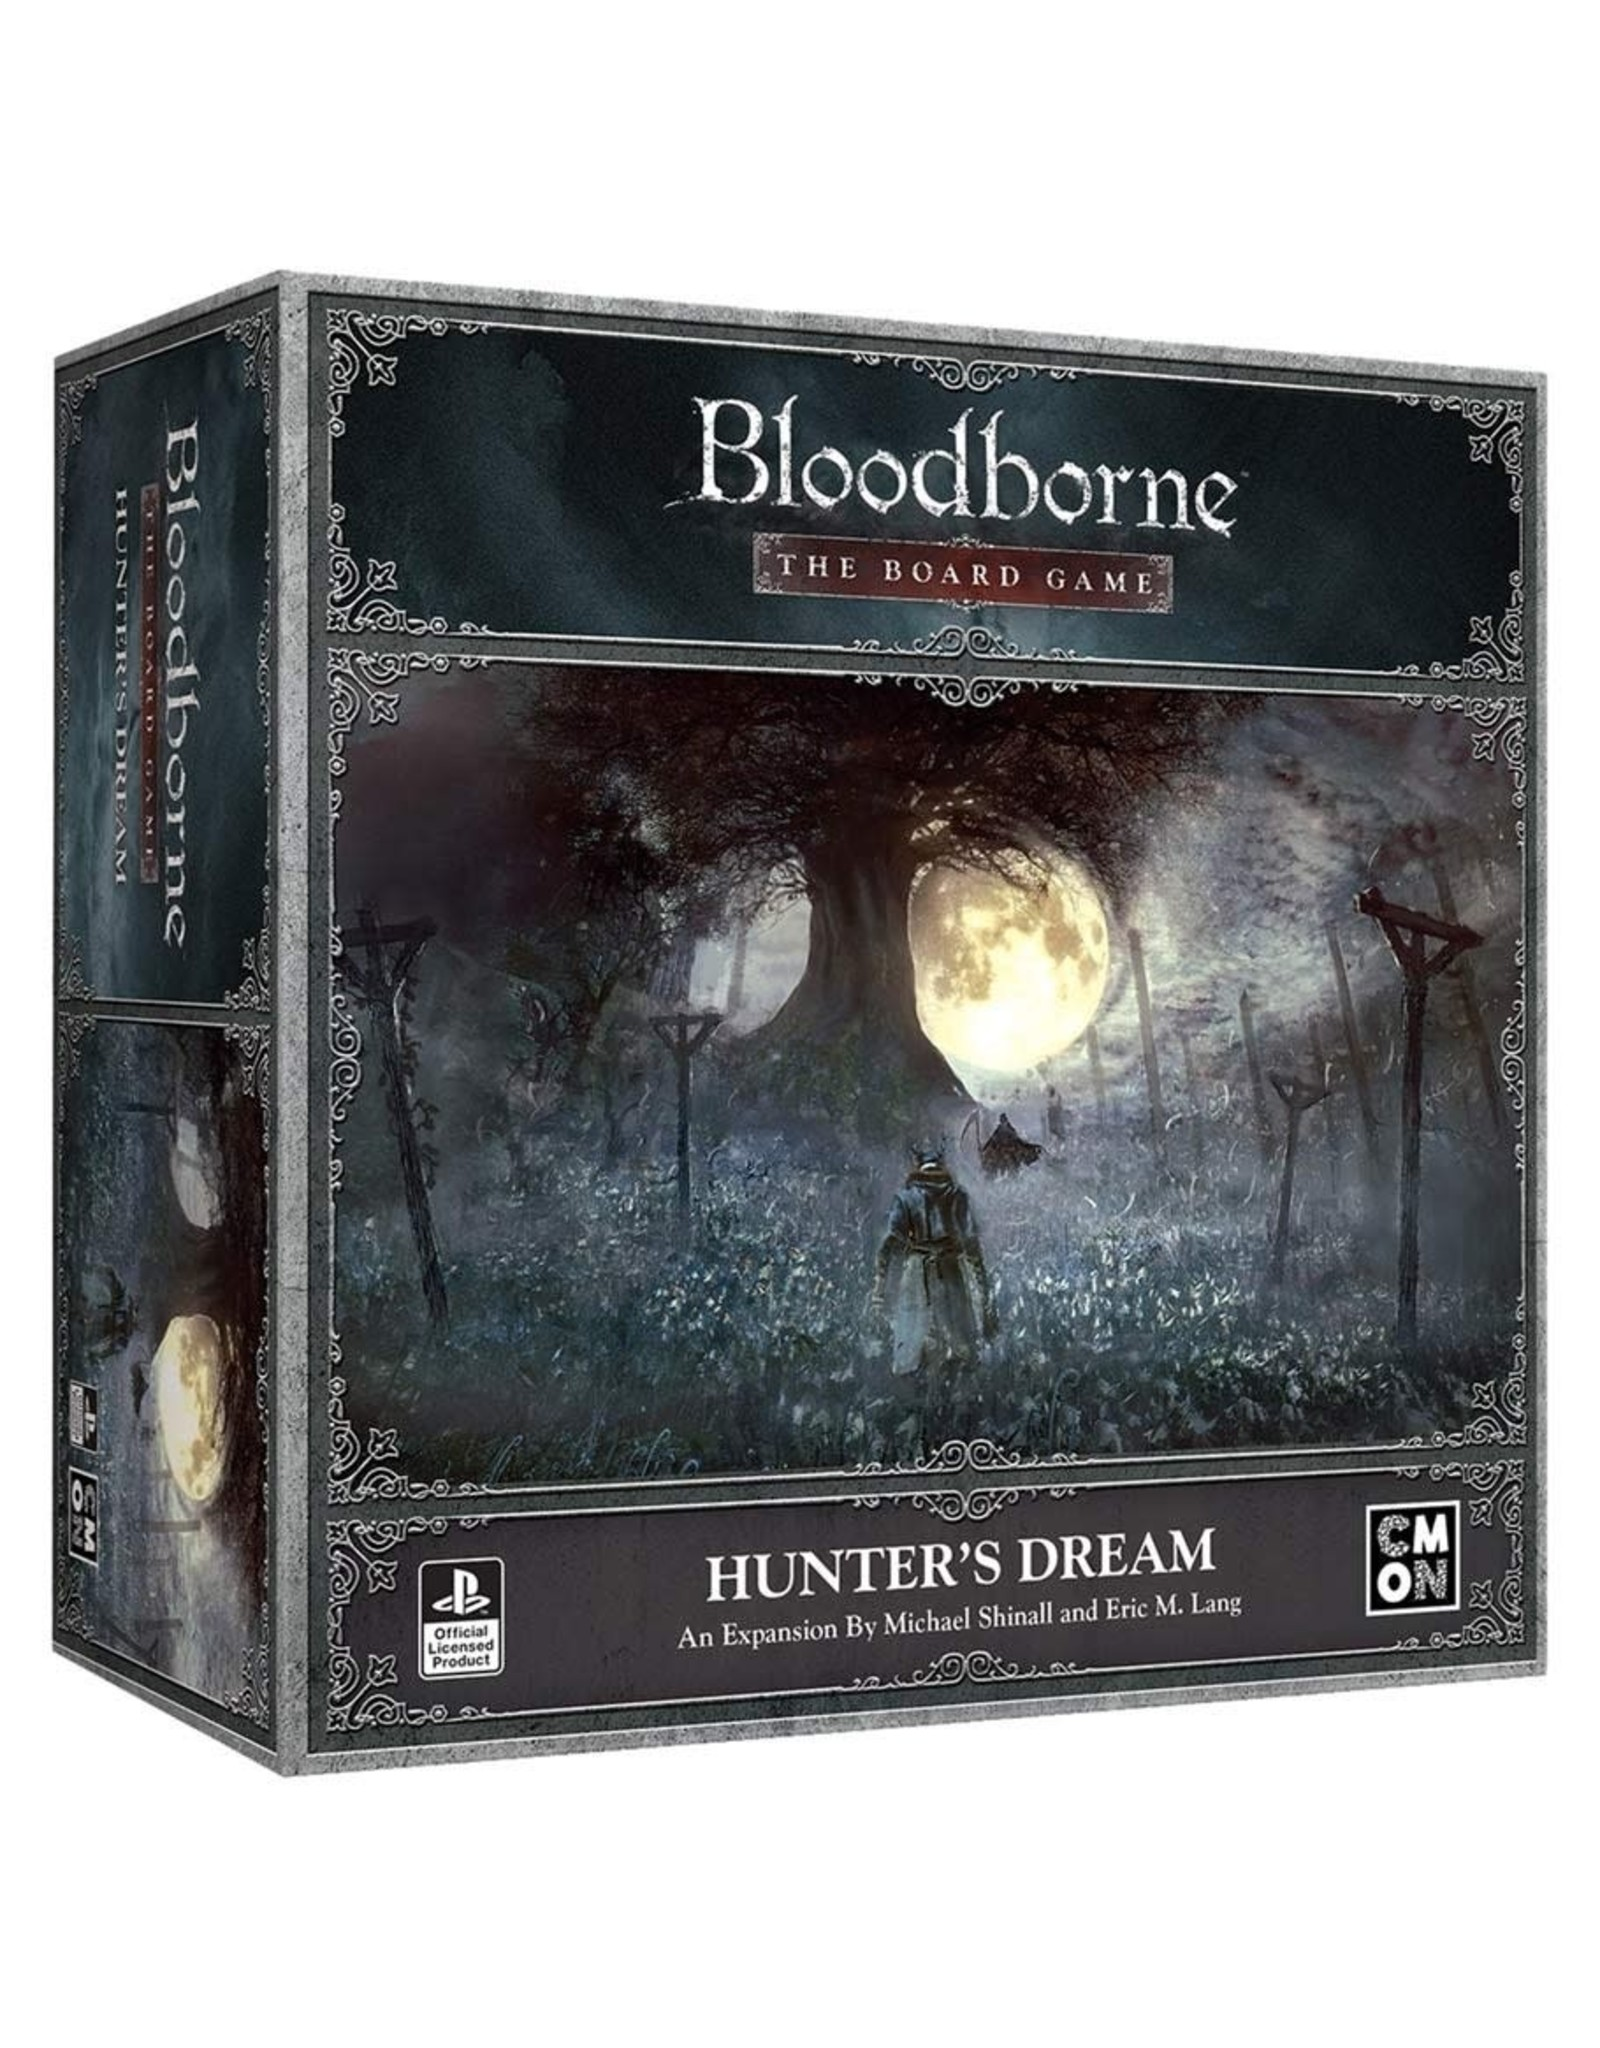 Cool Mini or Not Bloodborne The Board Game: Hunter's Dream